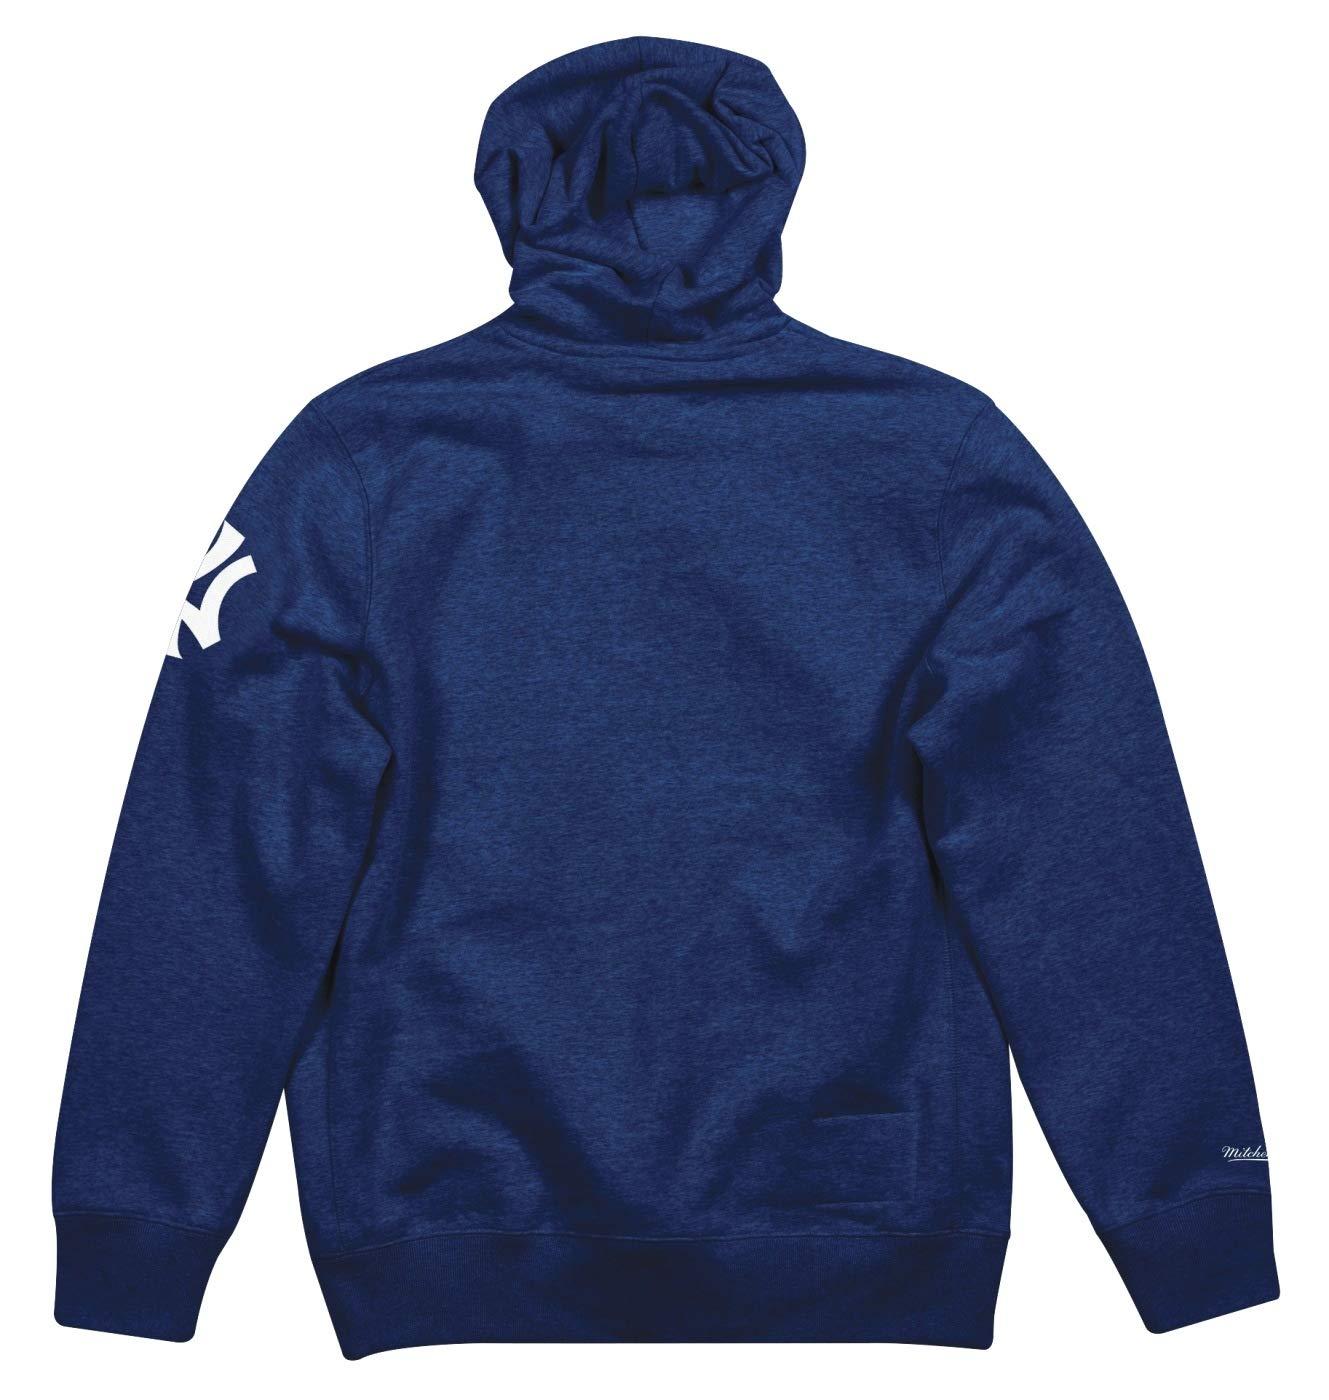 new style 409e2 fda67 Mitchell & Ness New York Yankees MLB Playoff Win Pullover Hooded Sweatshirt